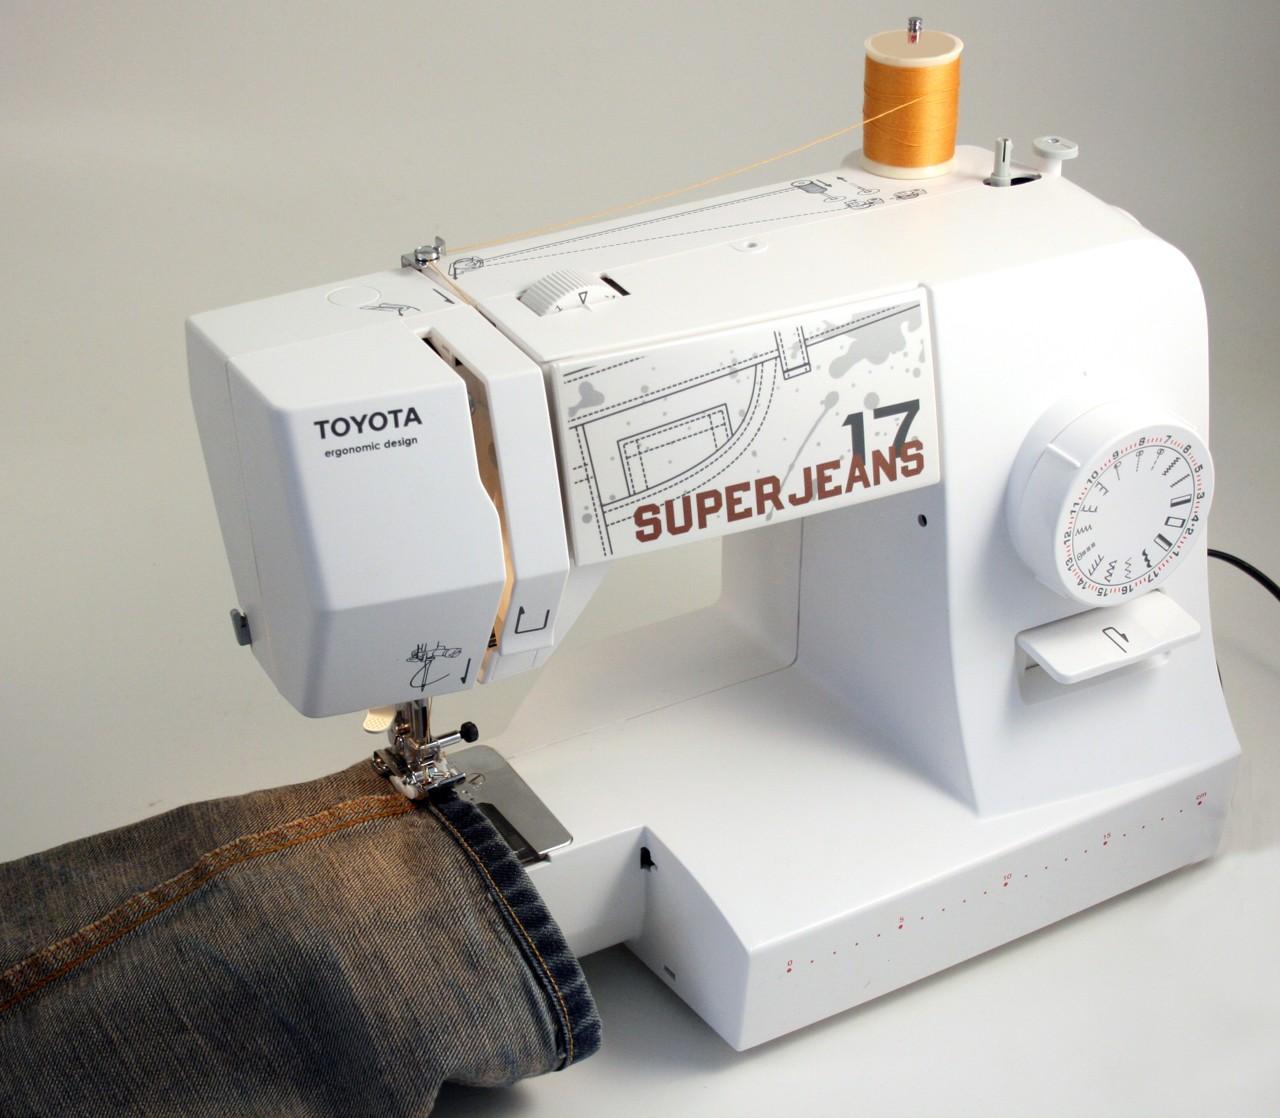 šicí stroj Toyota Super Jeans 17 bílý-1